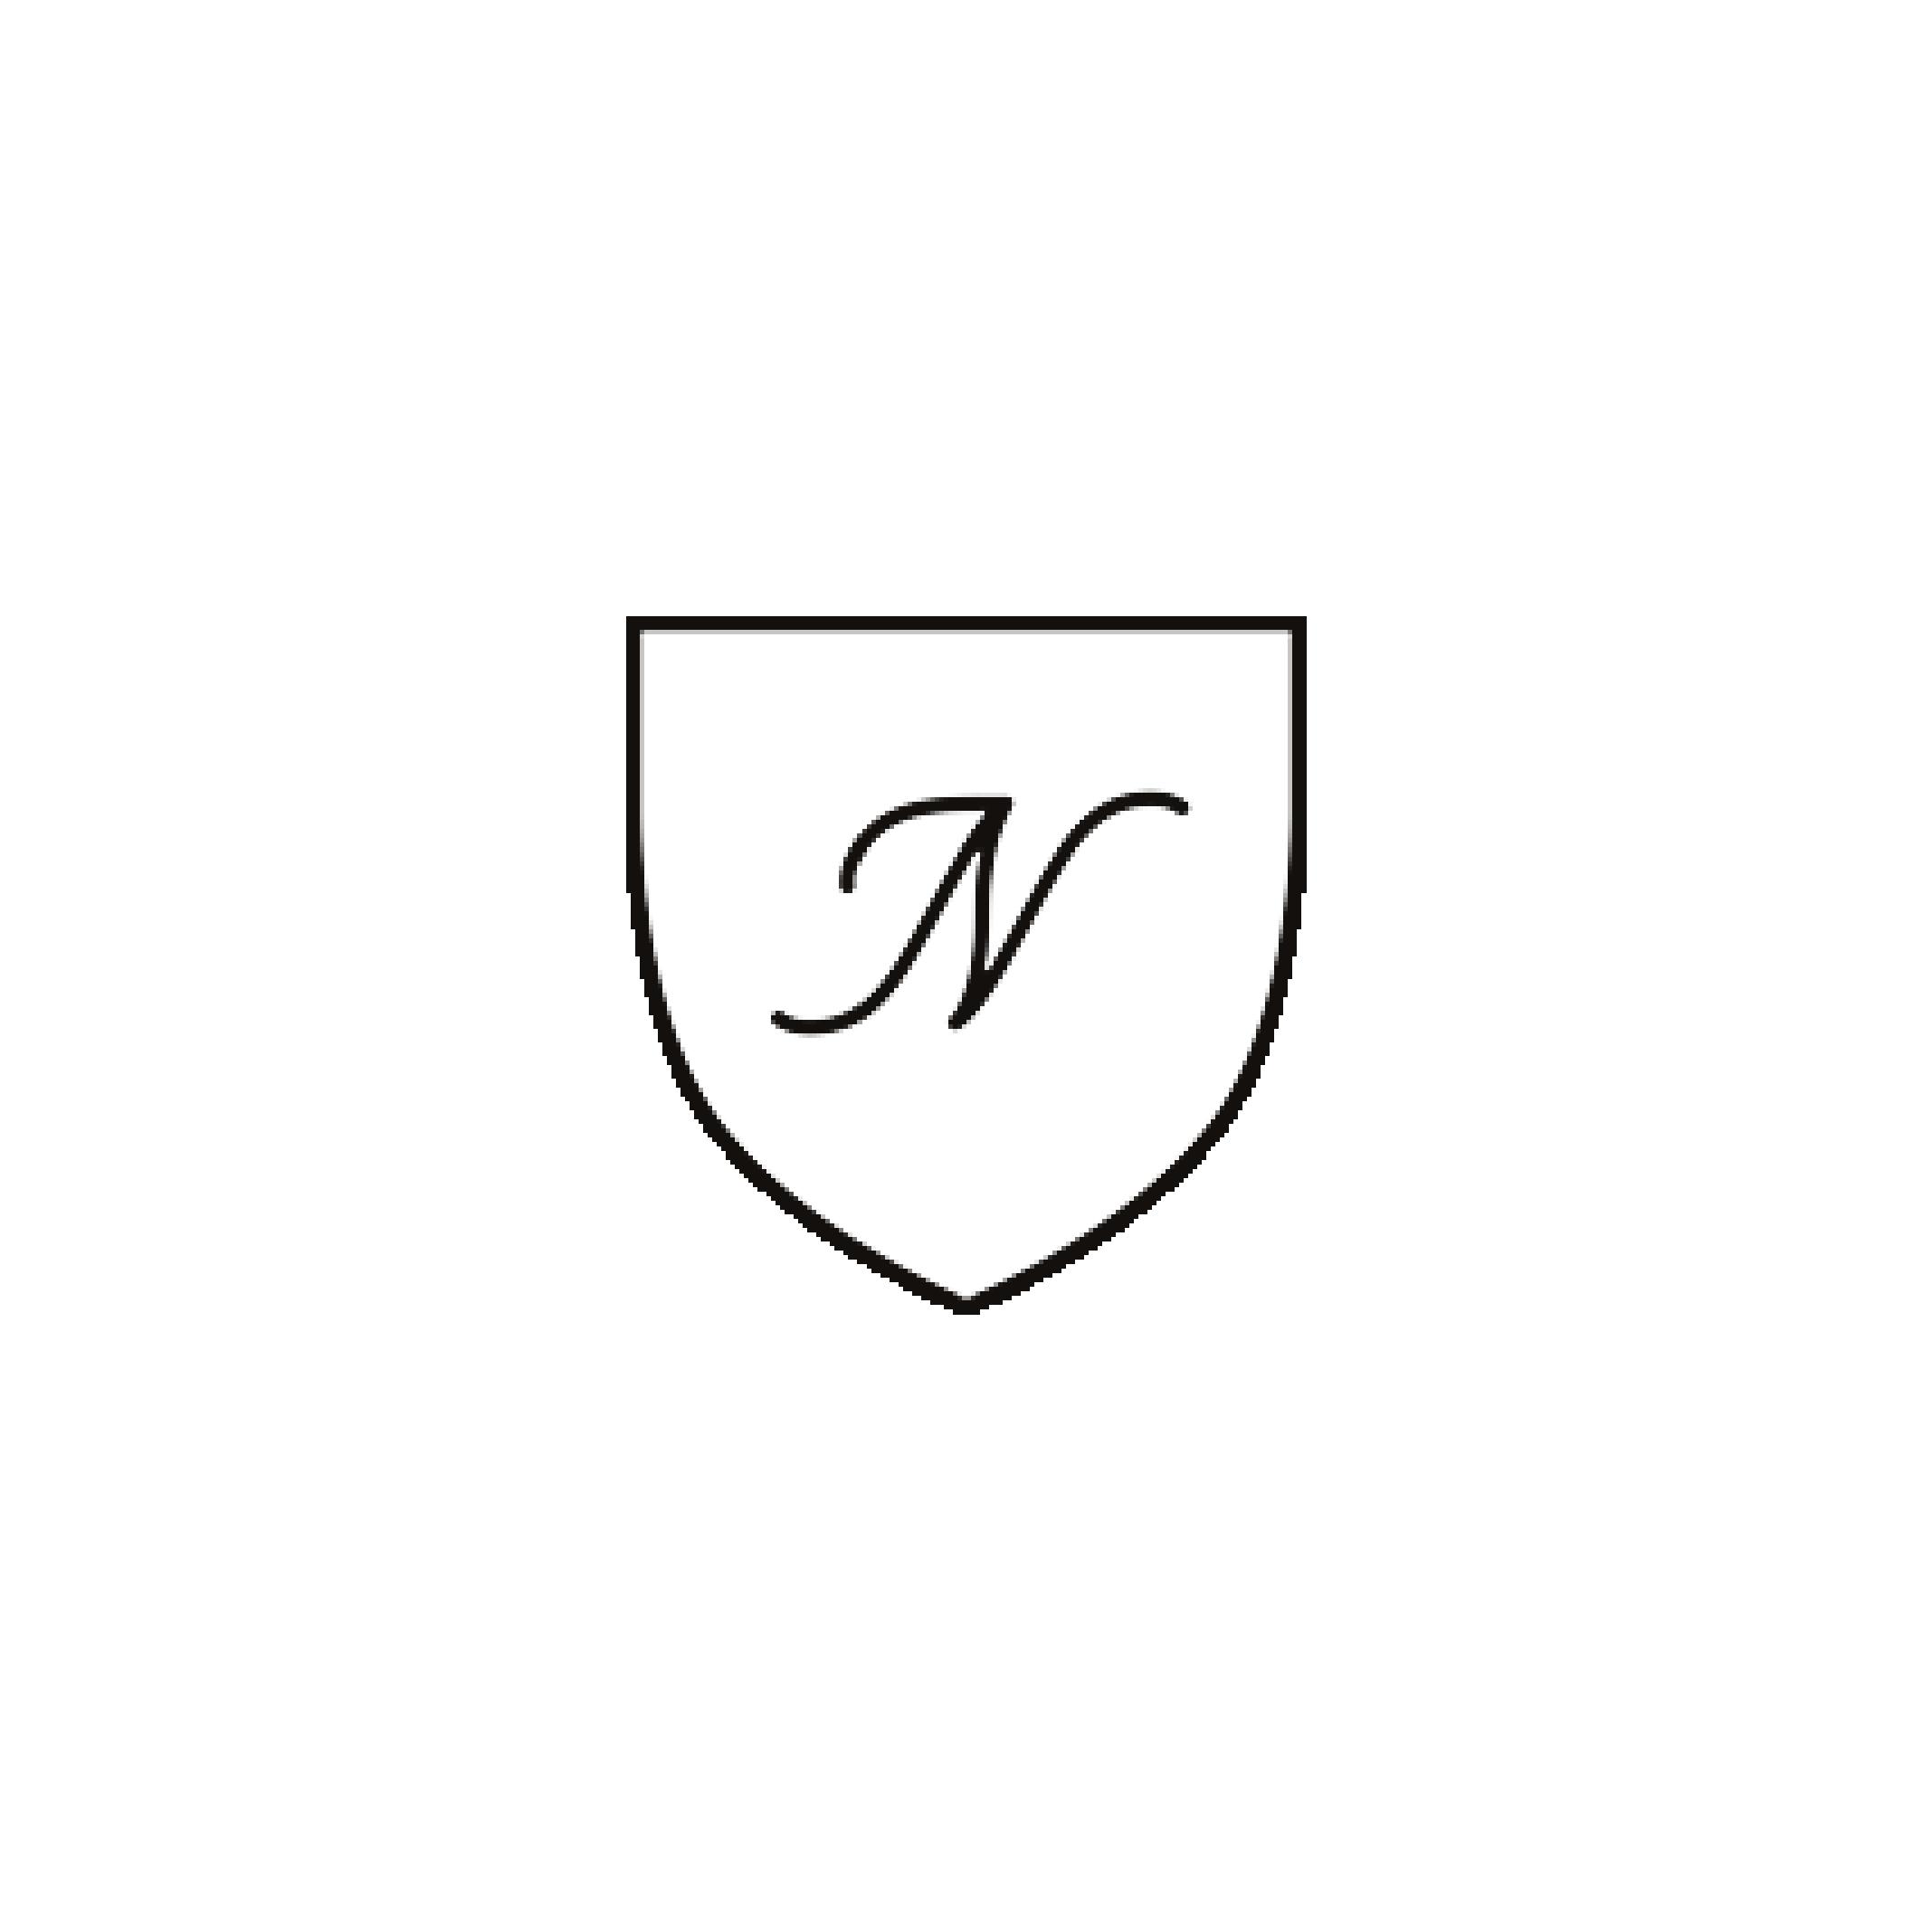 https://www.influxmediahouse.com/wp-content/uploads/2020/01/Logo_CN-colour.png